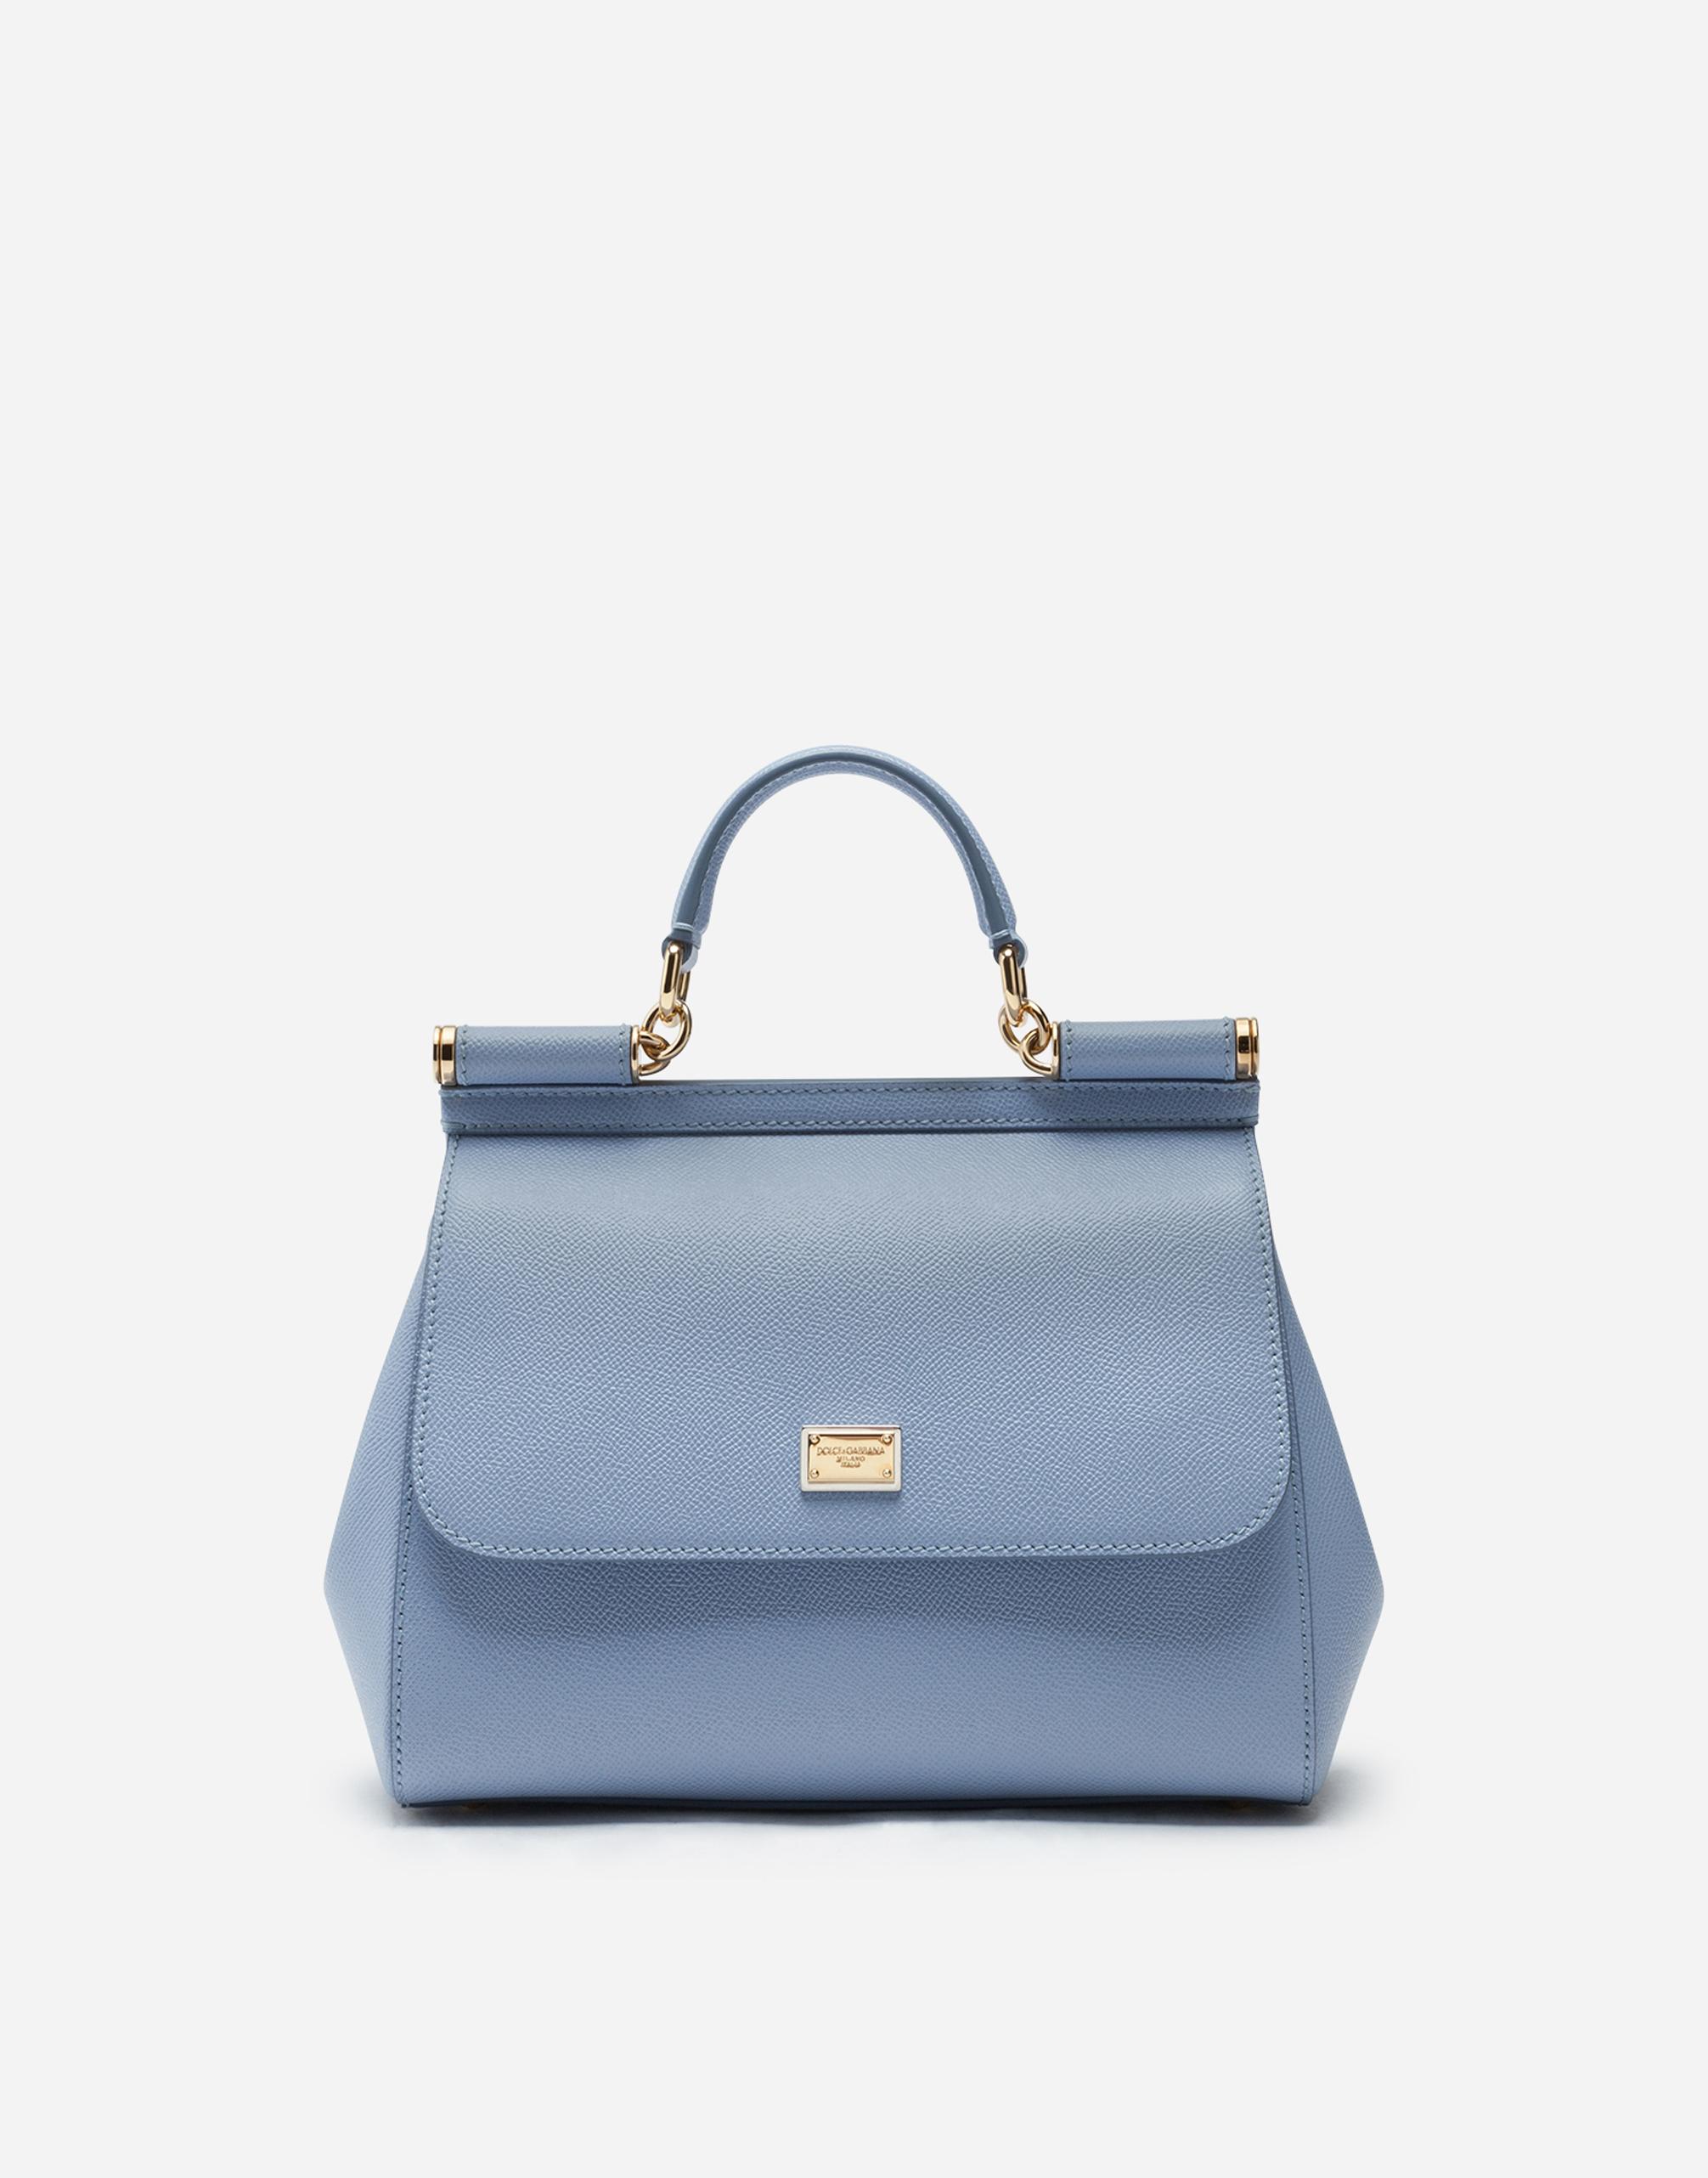 Dolce & Gabbana Medium Dauphine Leather Sicily Bag In Light Blue